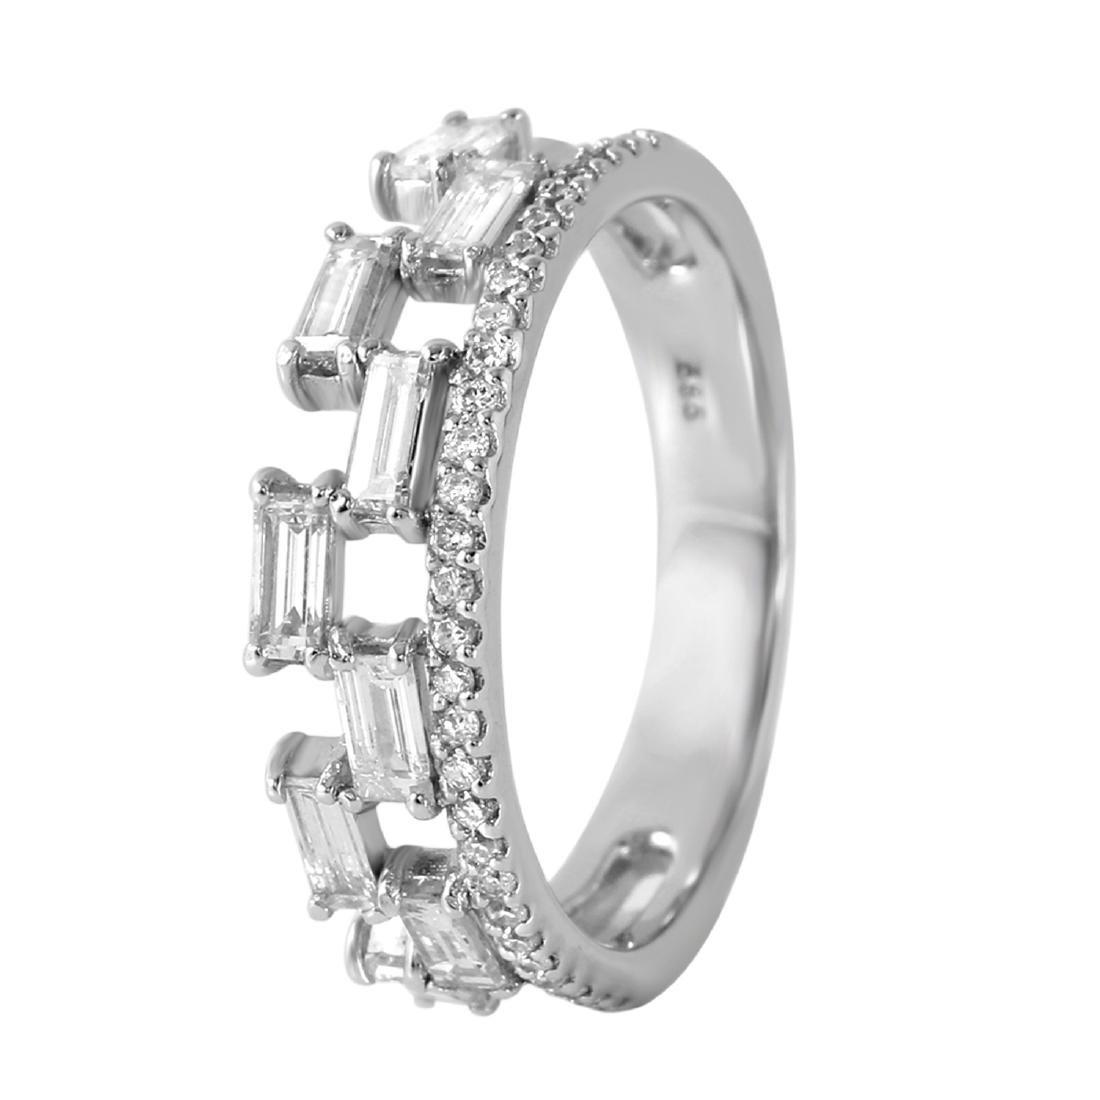 0.80 Carat Natural Diamond 18K Solid White Gold Ring